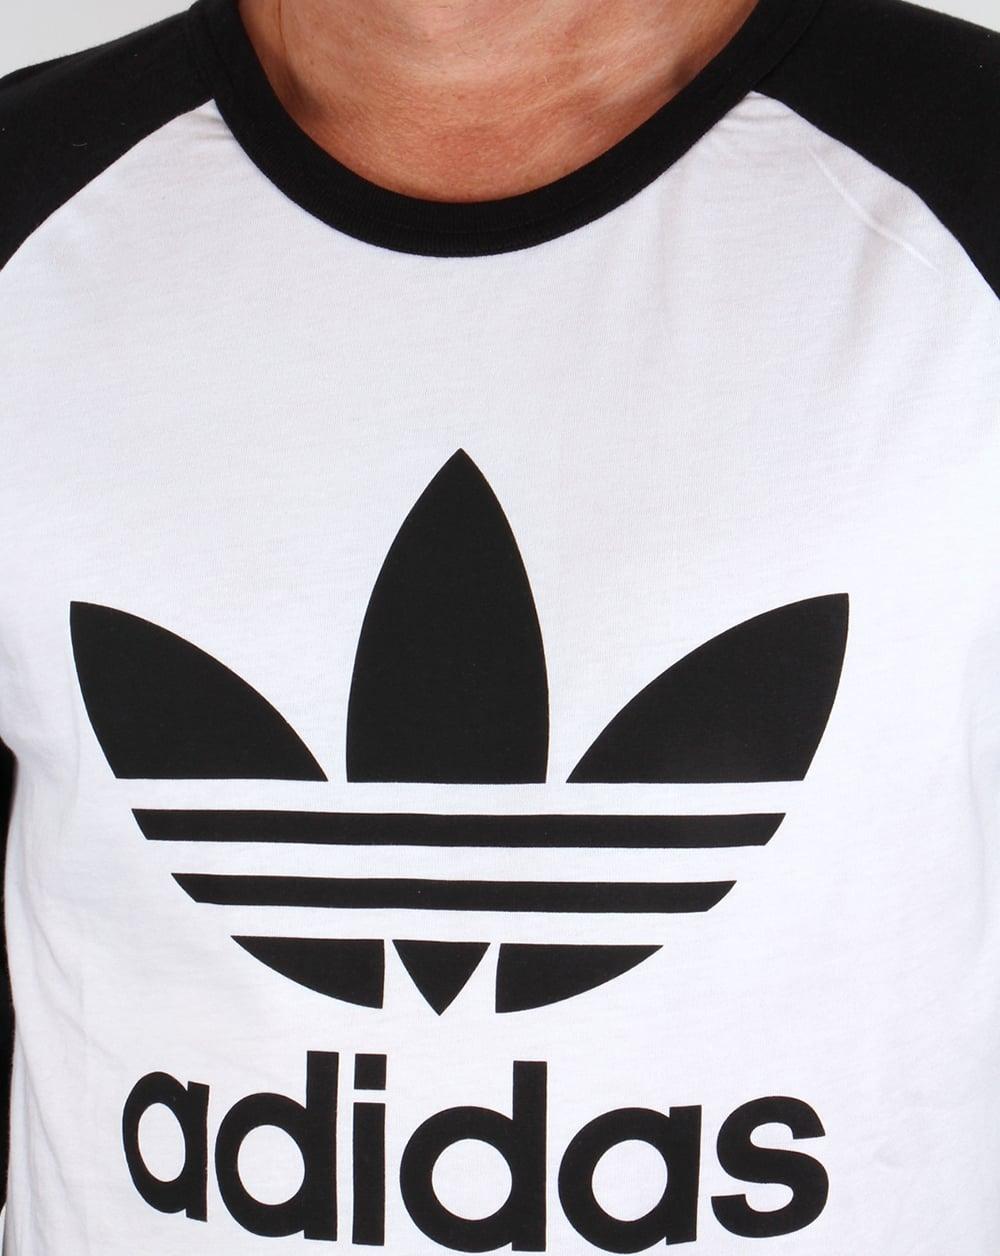 ec449df823 Adidas Originals Trefoil Long Sleeve Raglan T-shirt White/black